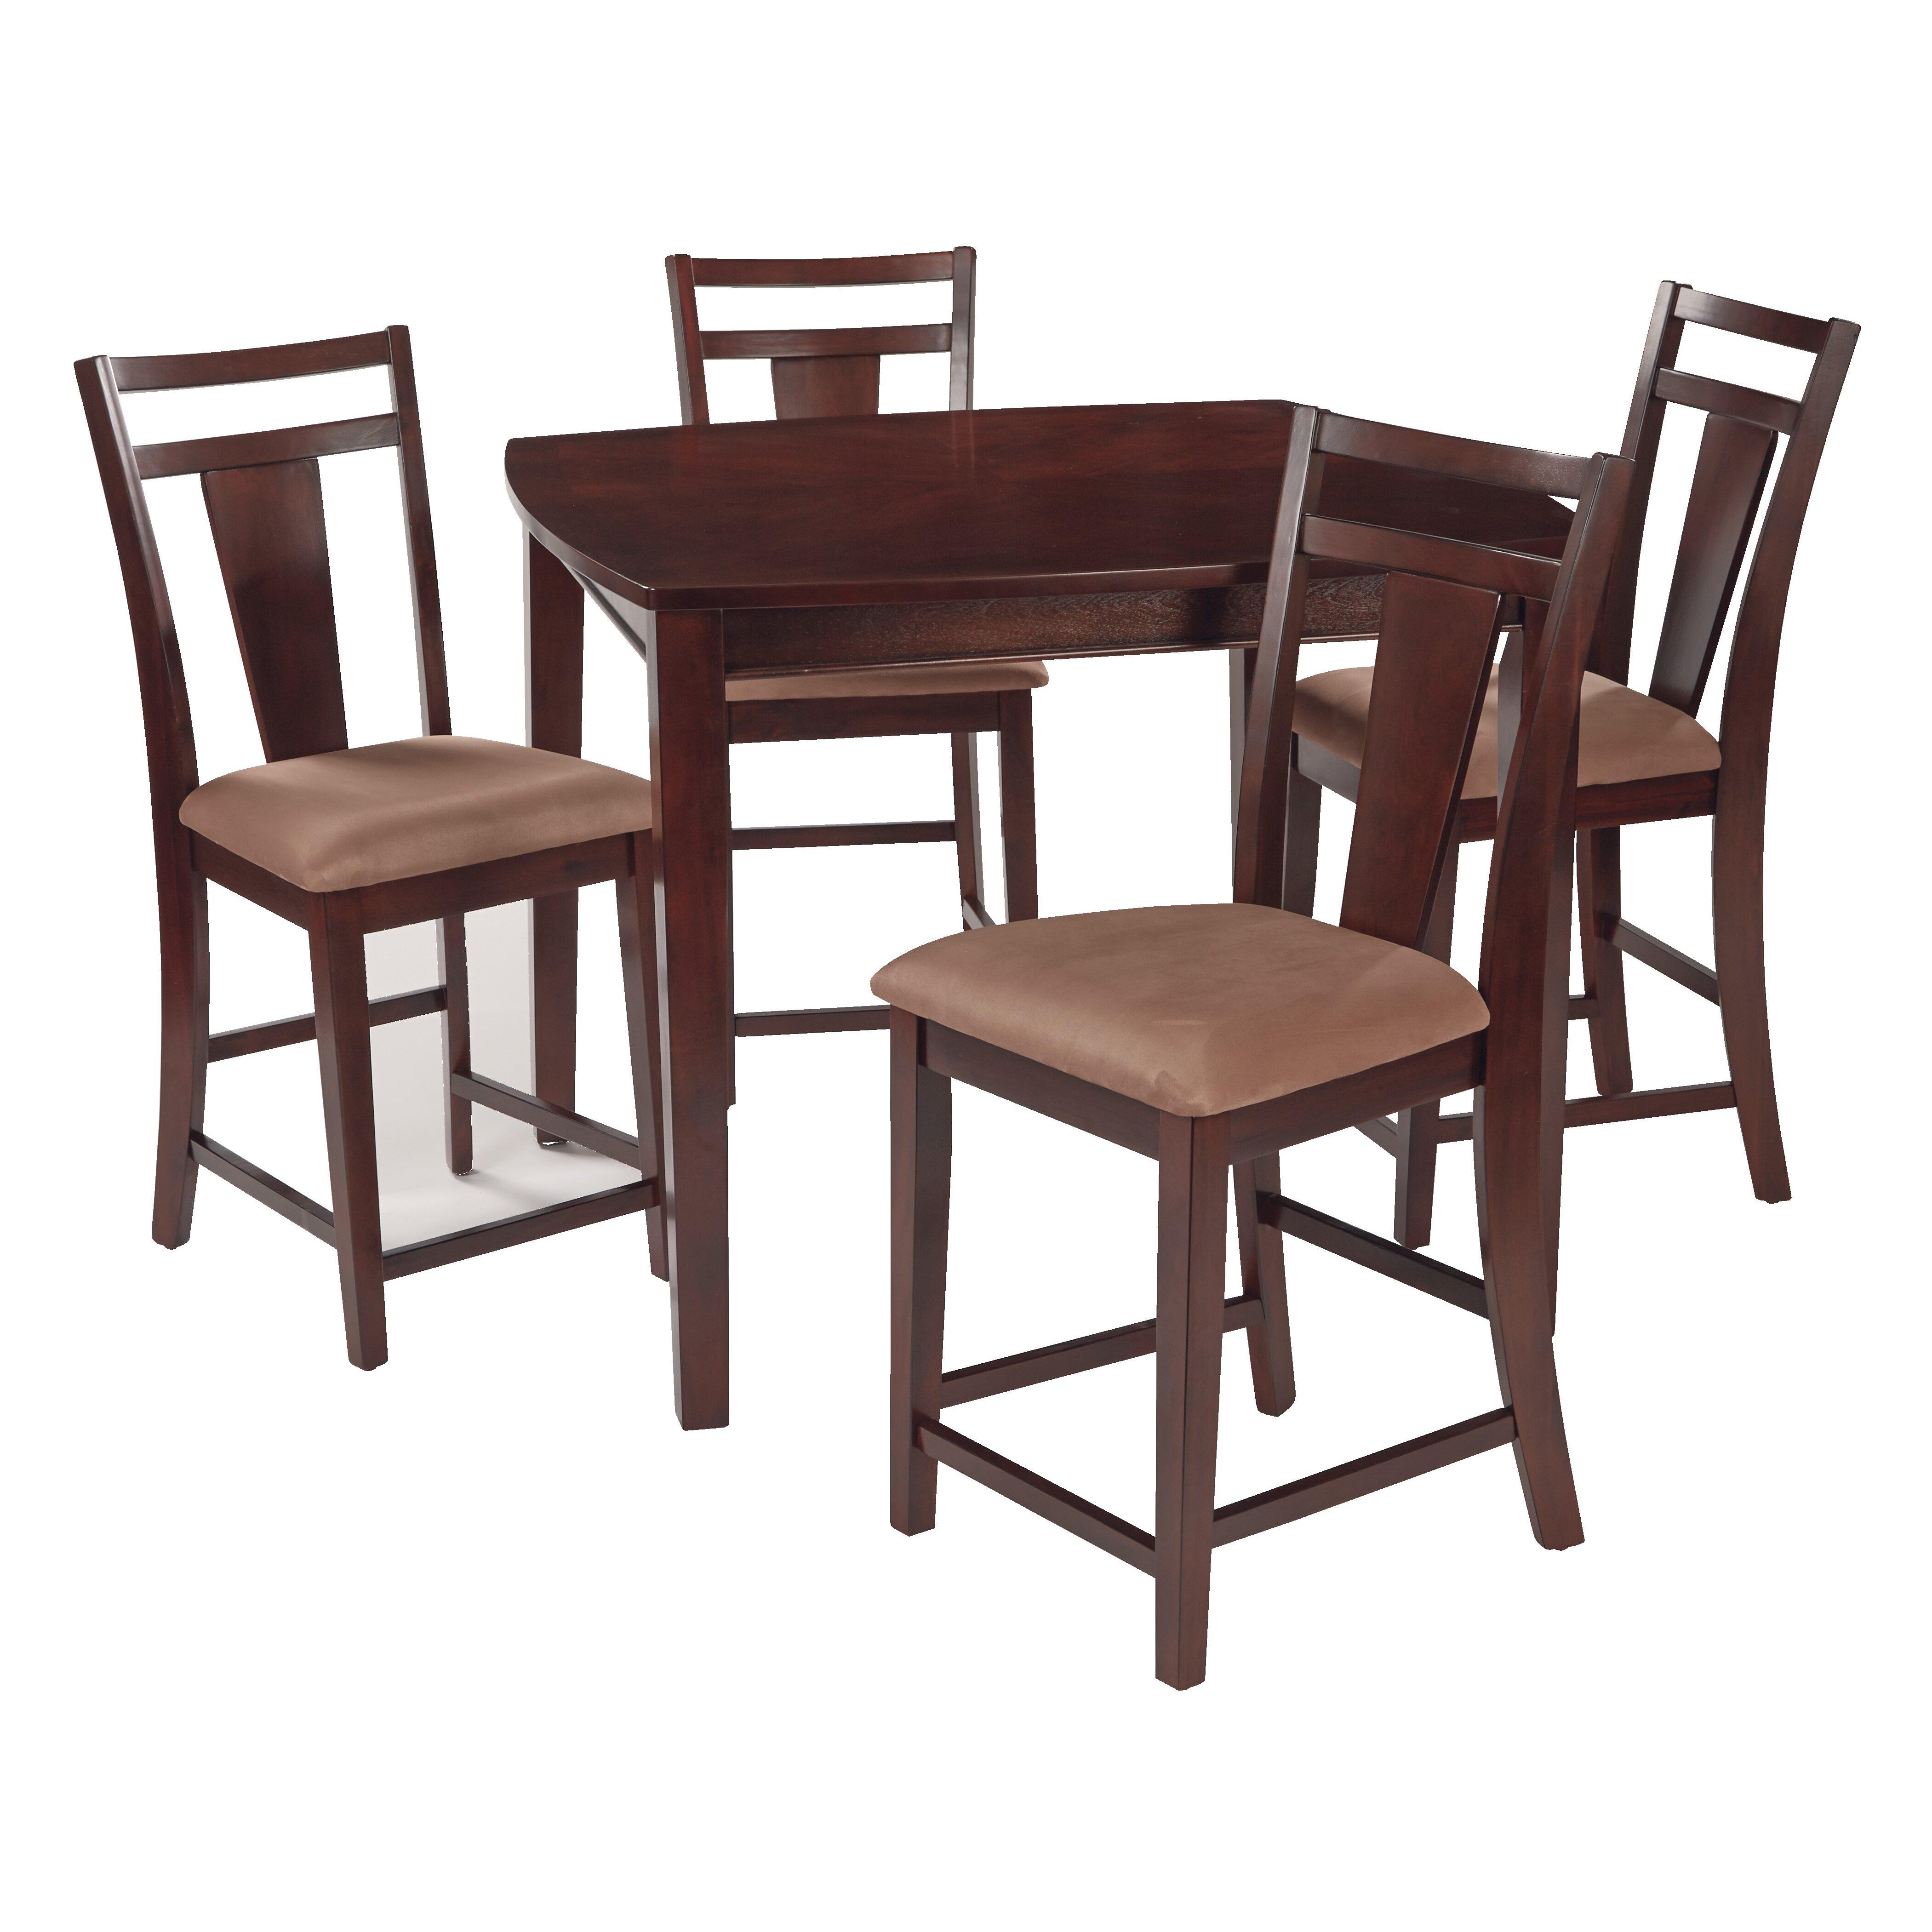 osp designs brentwood 5 piece pub table set reviews wayfair. Black Bedroom Furniture Sets. Home Design Ideas